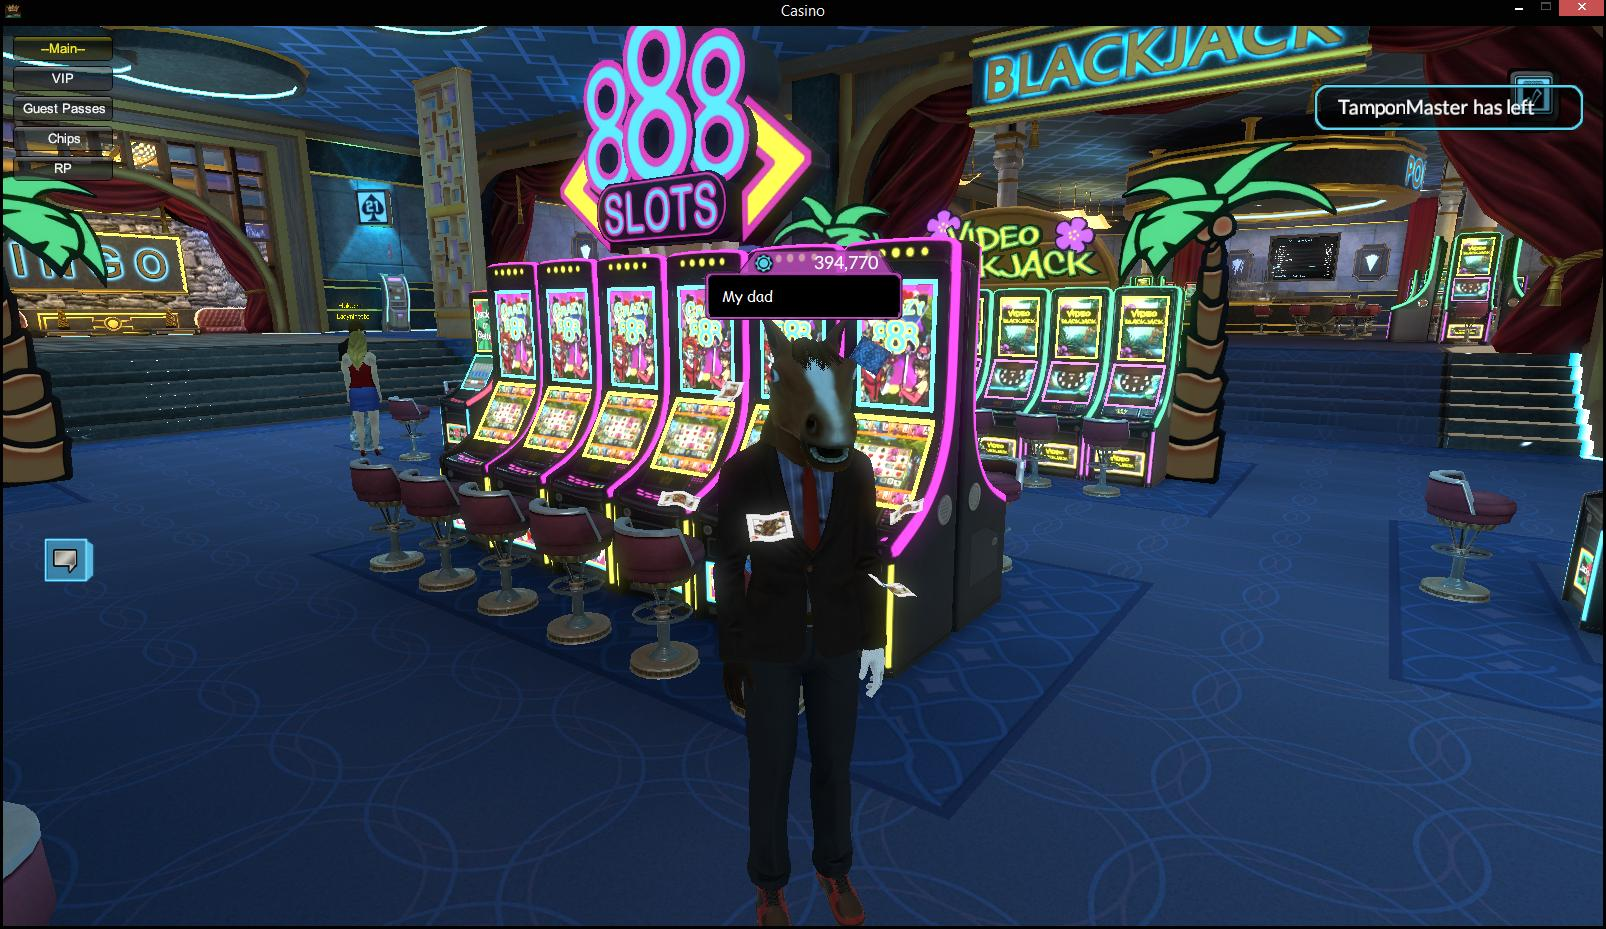 Casino para smartphones blackjack online gratis multijugador 29142